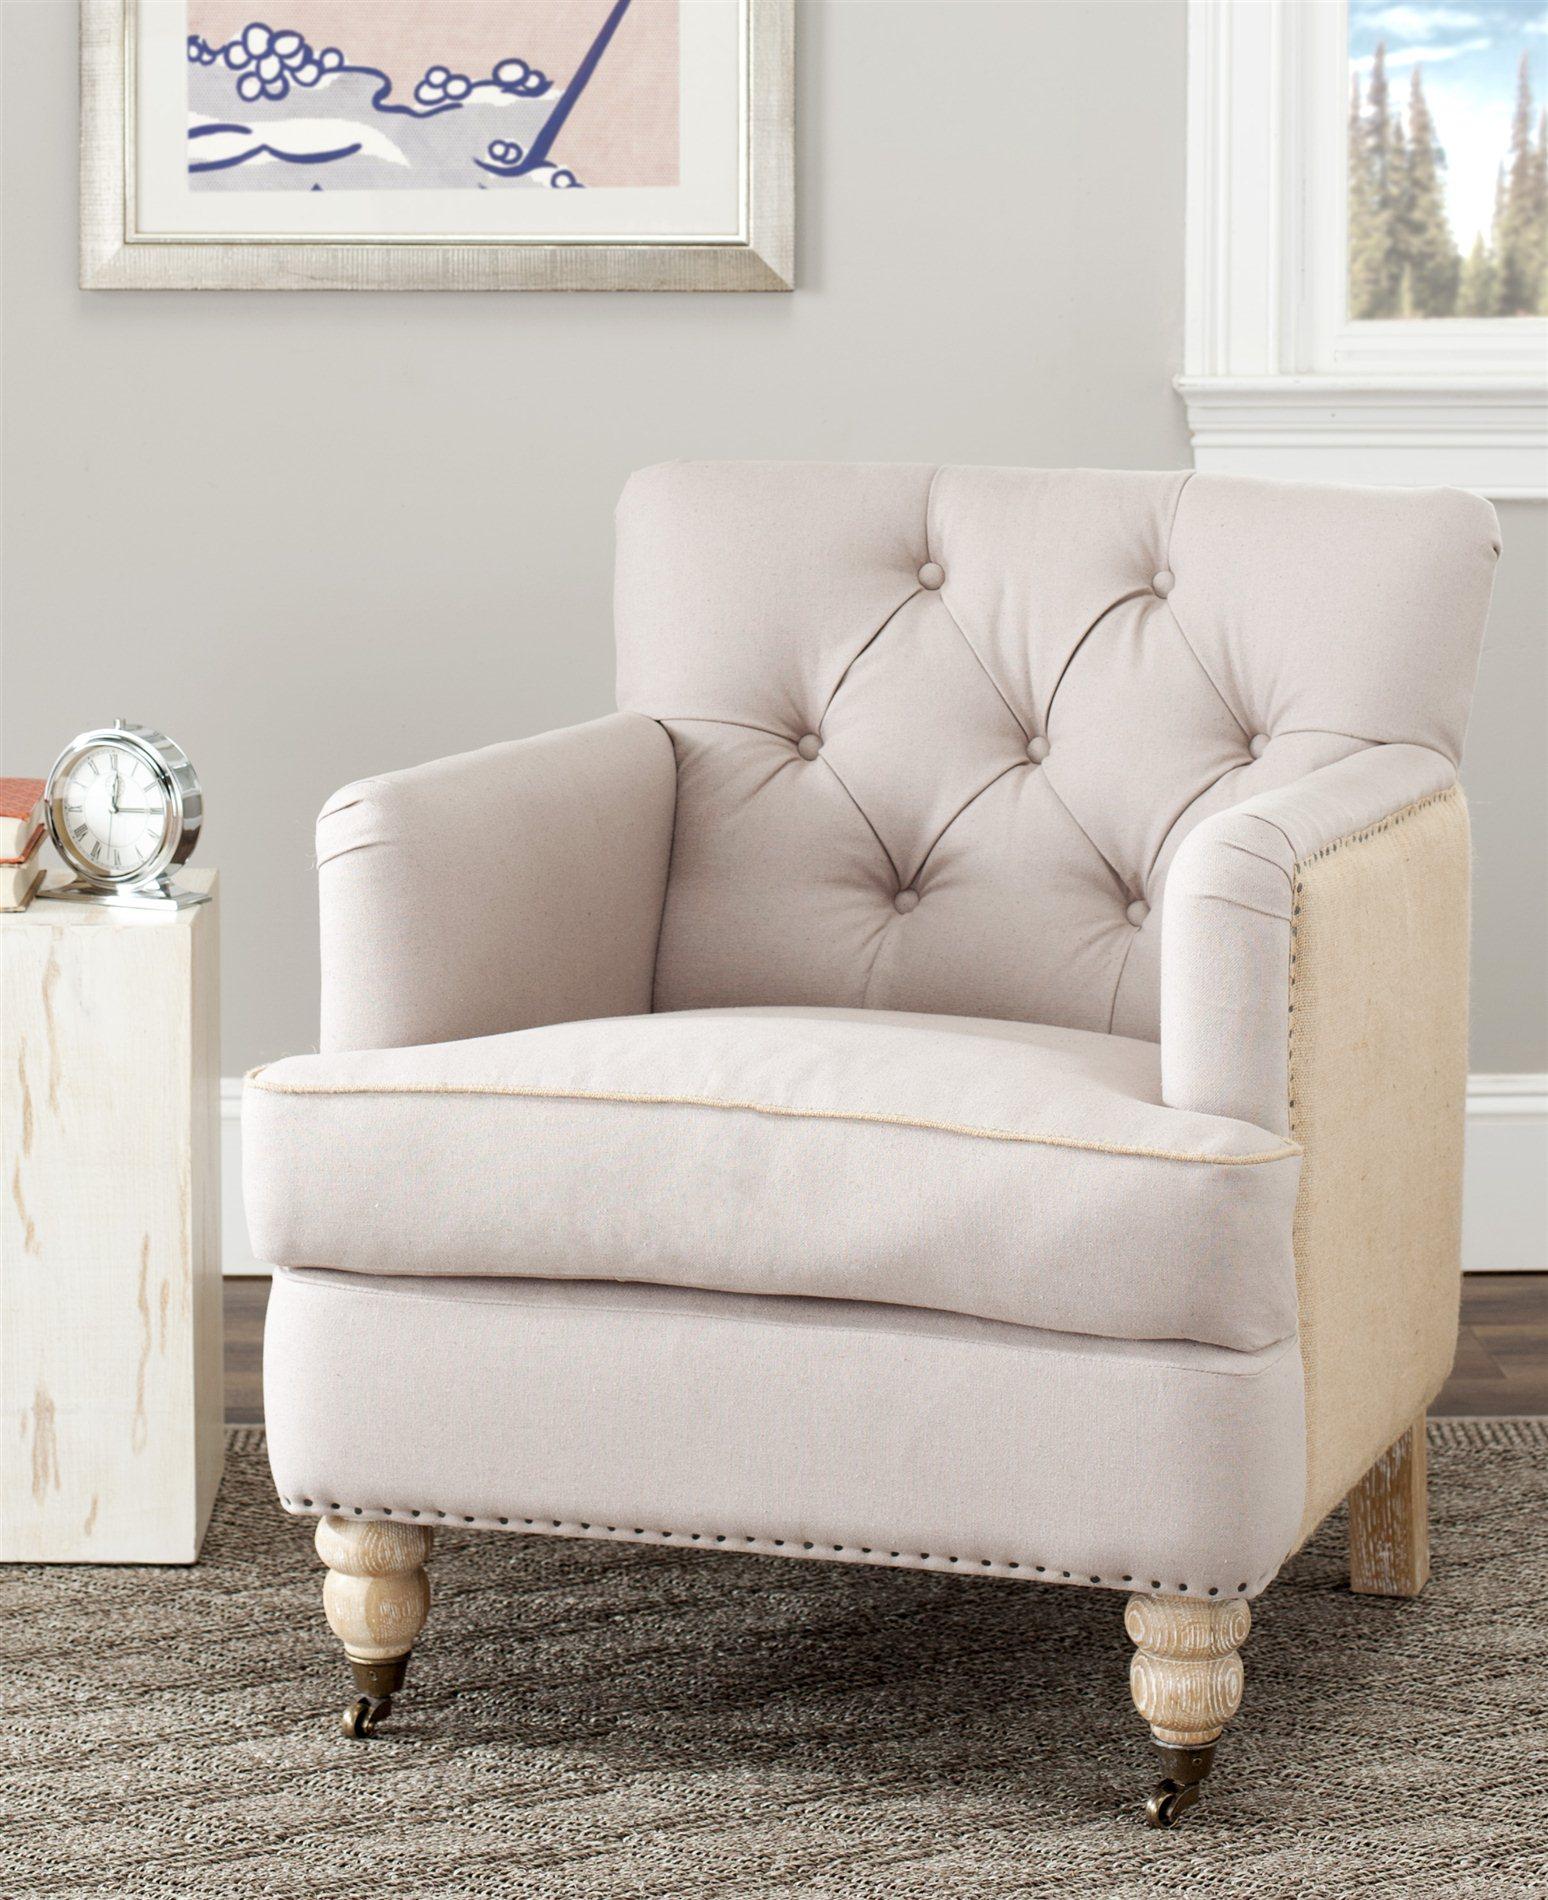 safavieh colin tufted club chair xxl desk hud8212g sfv